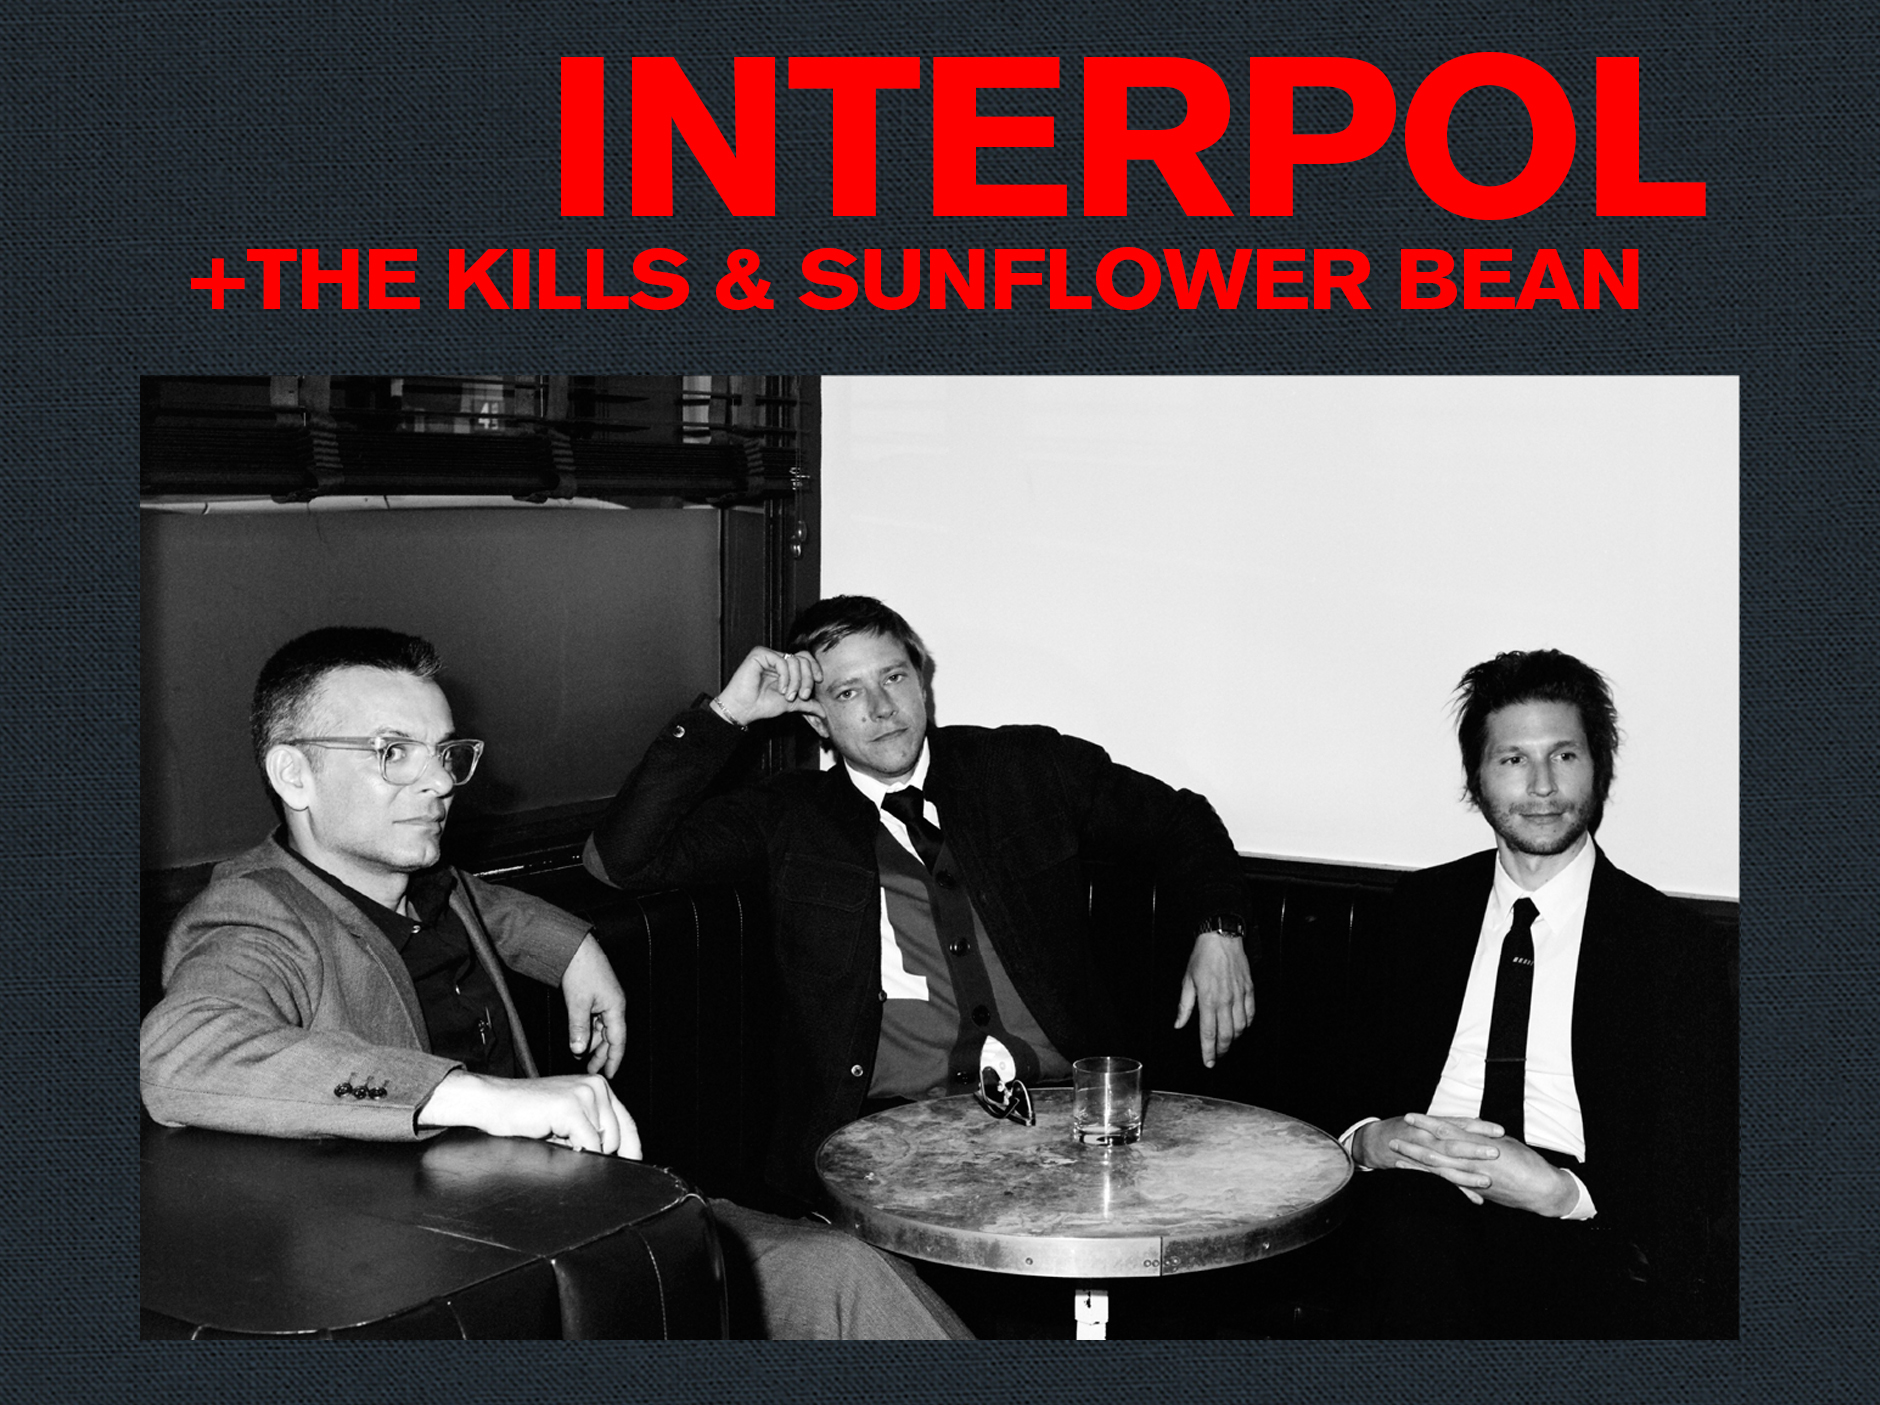 Interpol - +The Kills & Sunflower BeanThursday, October 4th